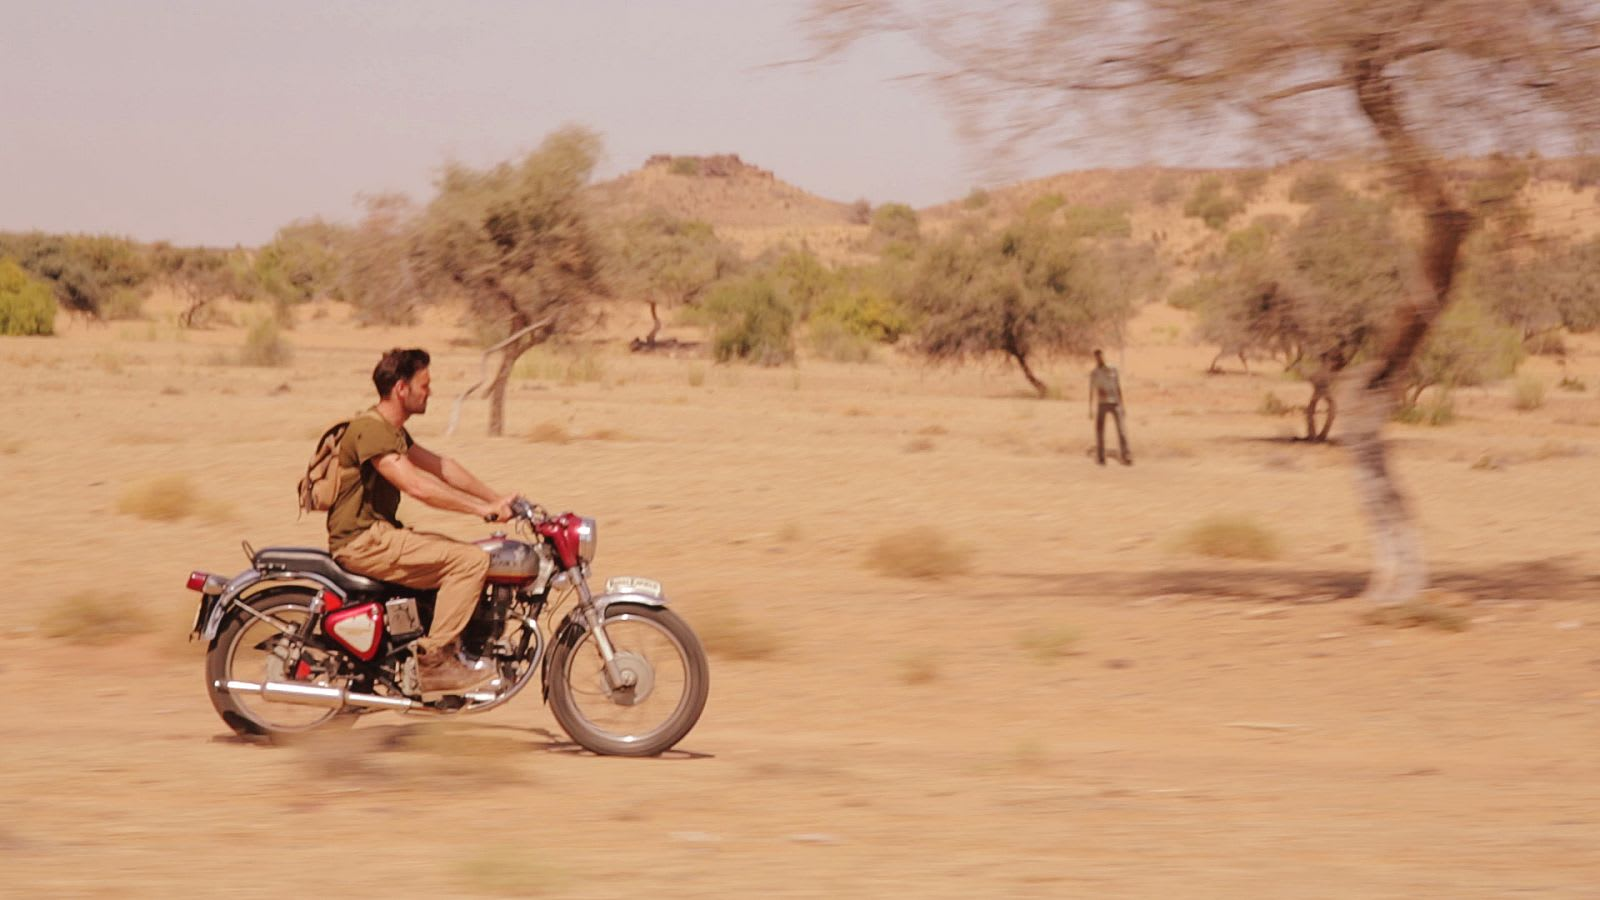 The Dead 2 Bike Ride